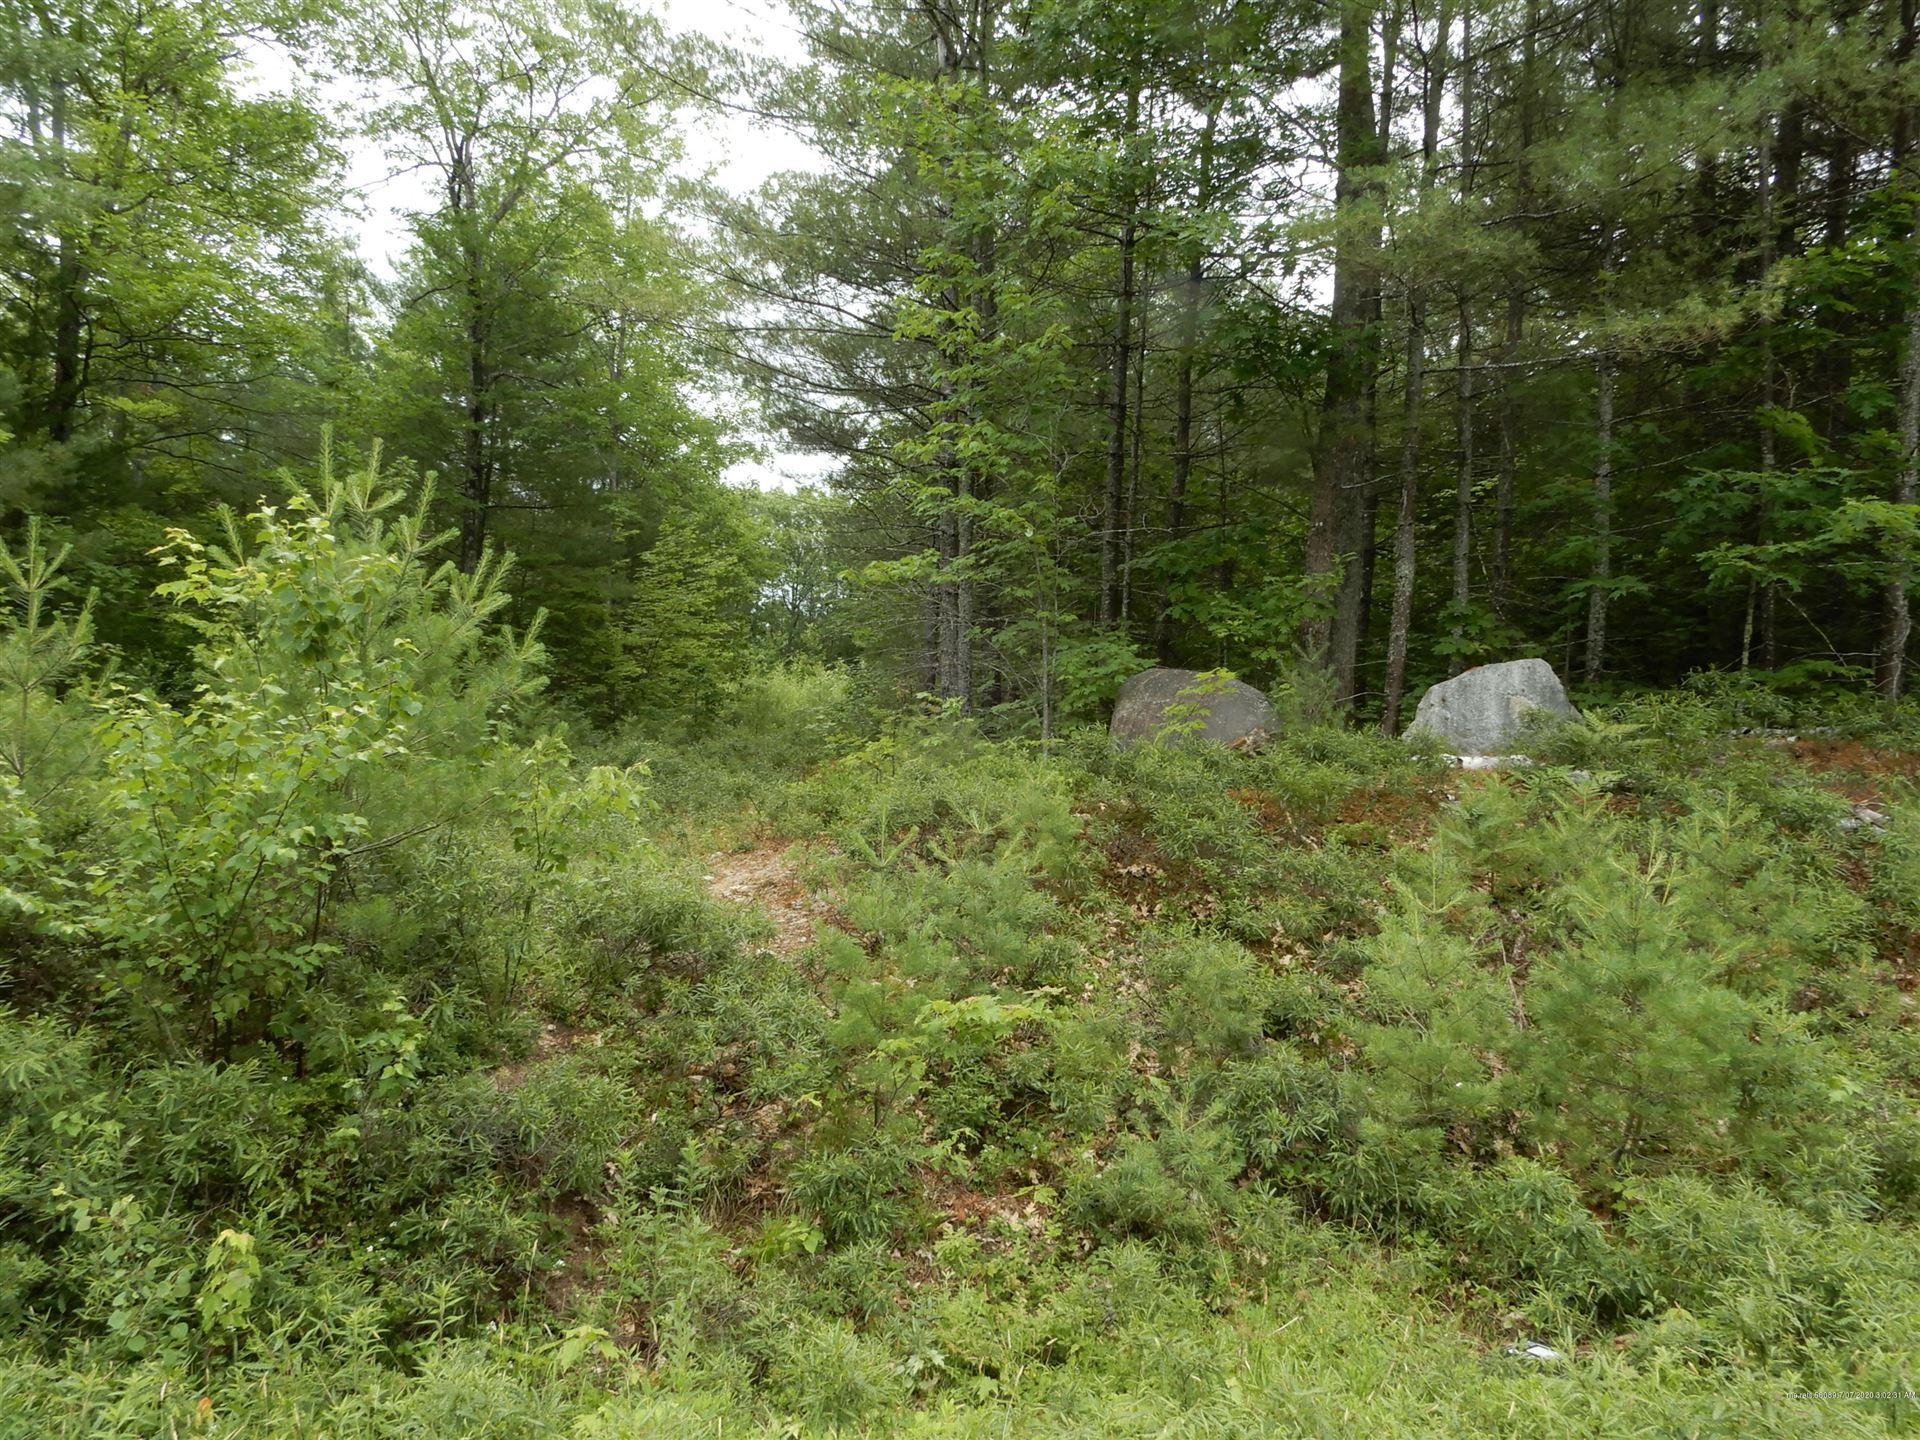 Photo of Lot 6 Oak Woods, Hiram, ME 04041 (MLS # 1459151)